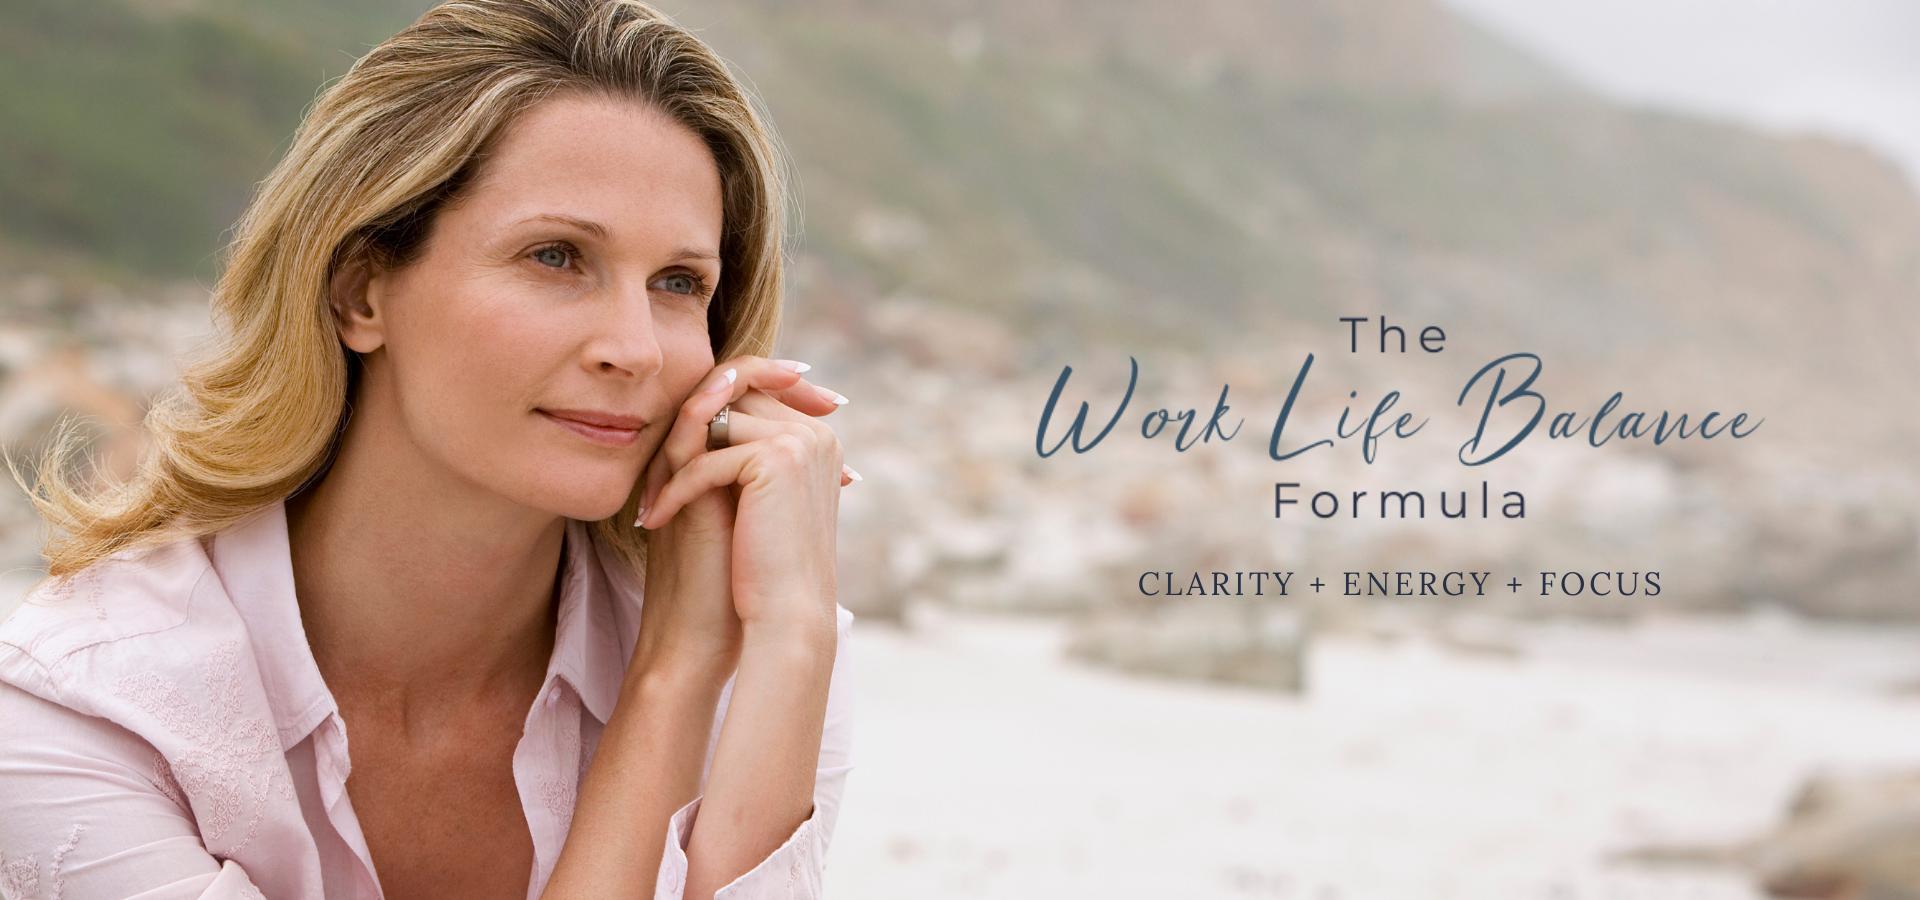 The Work Life Balance Formula